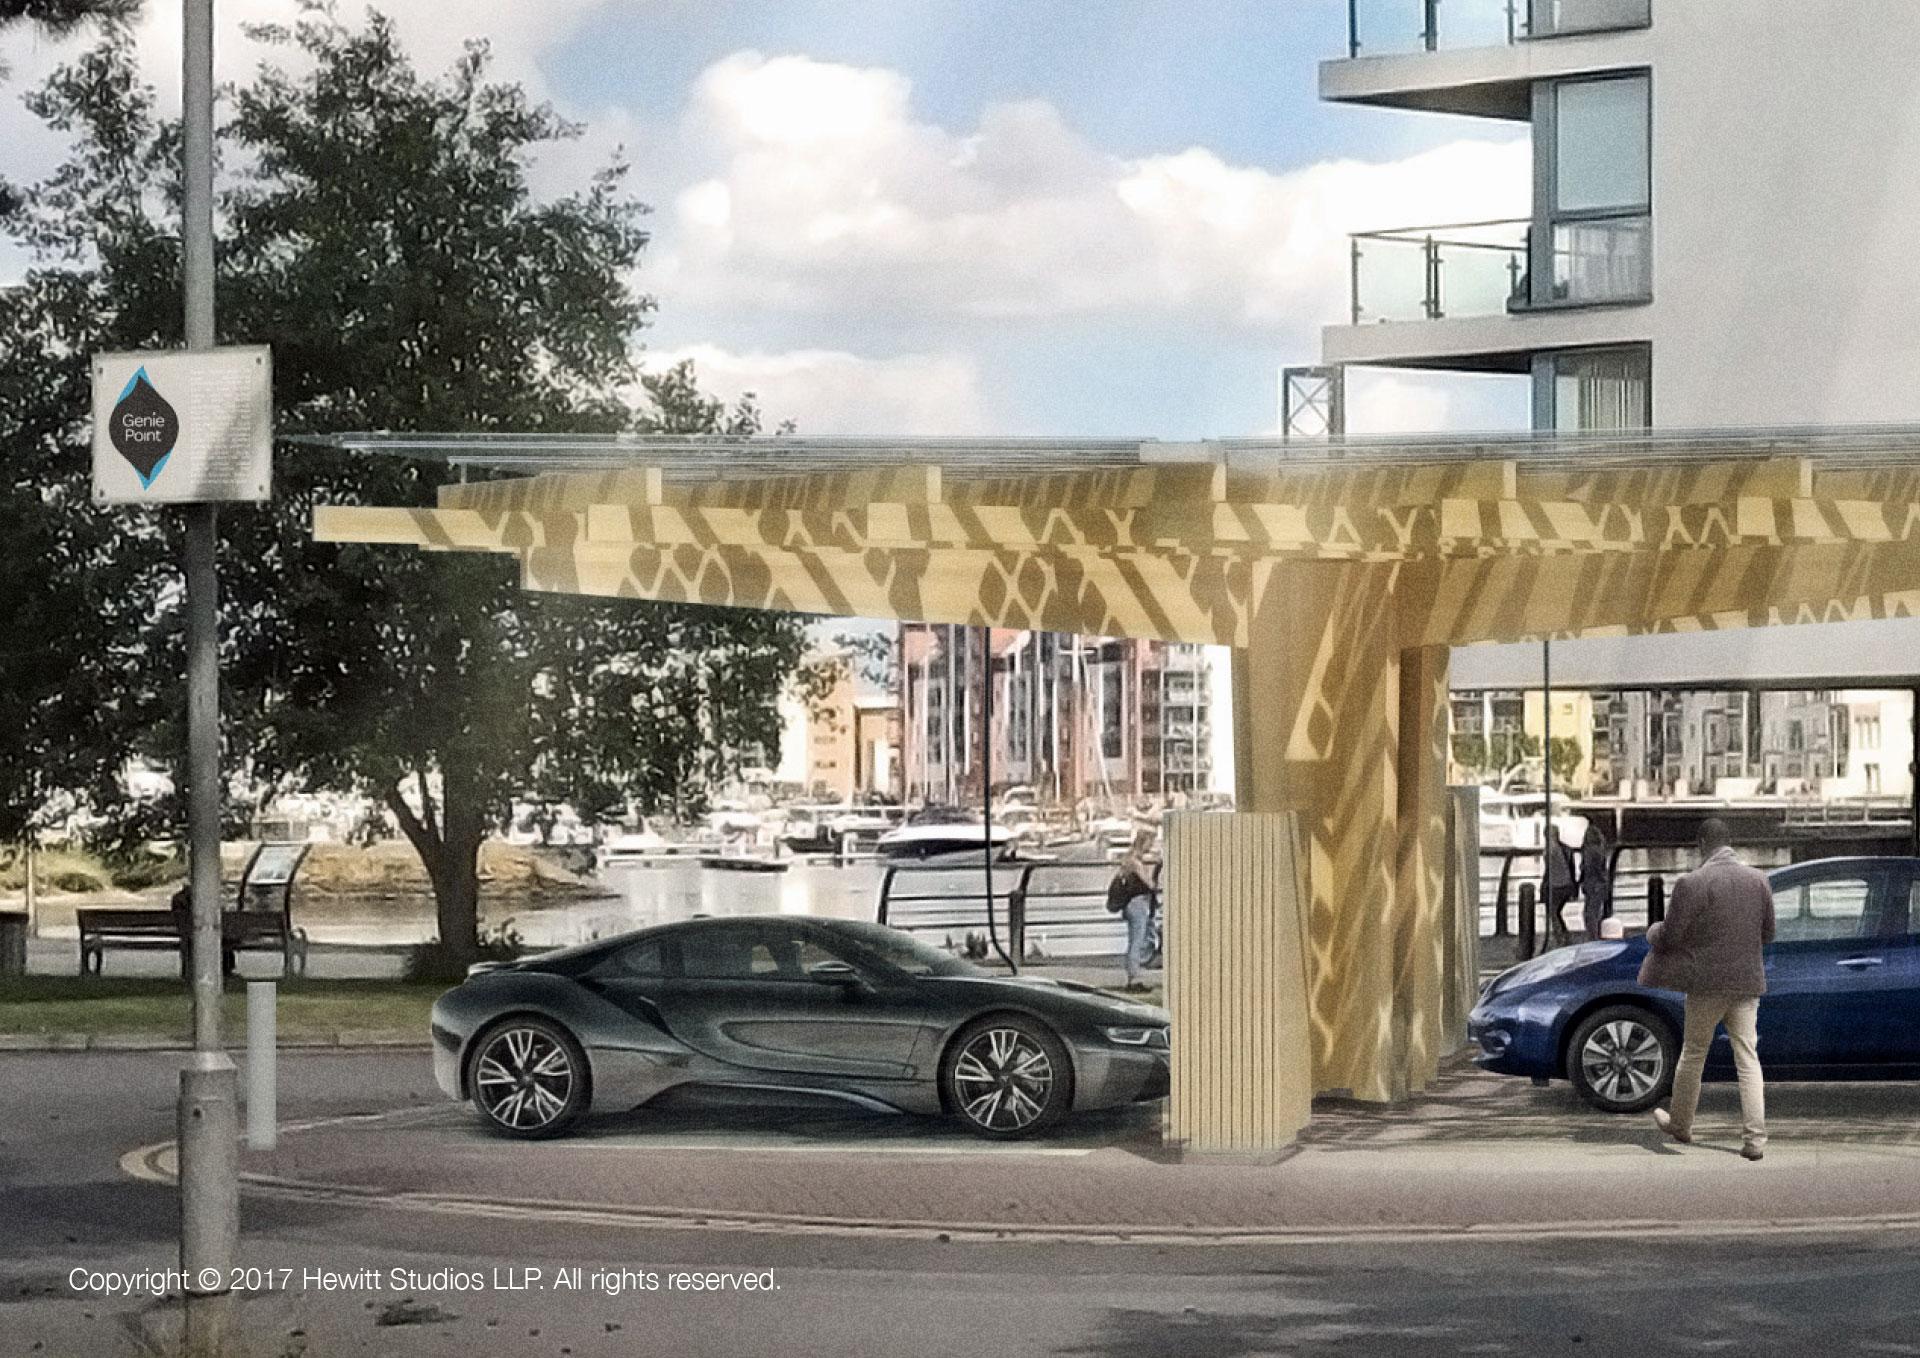 KPort Marina EV charging hub canopy Timber Structure BIPV BMW i8 Leaf